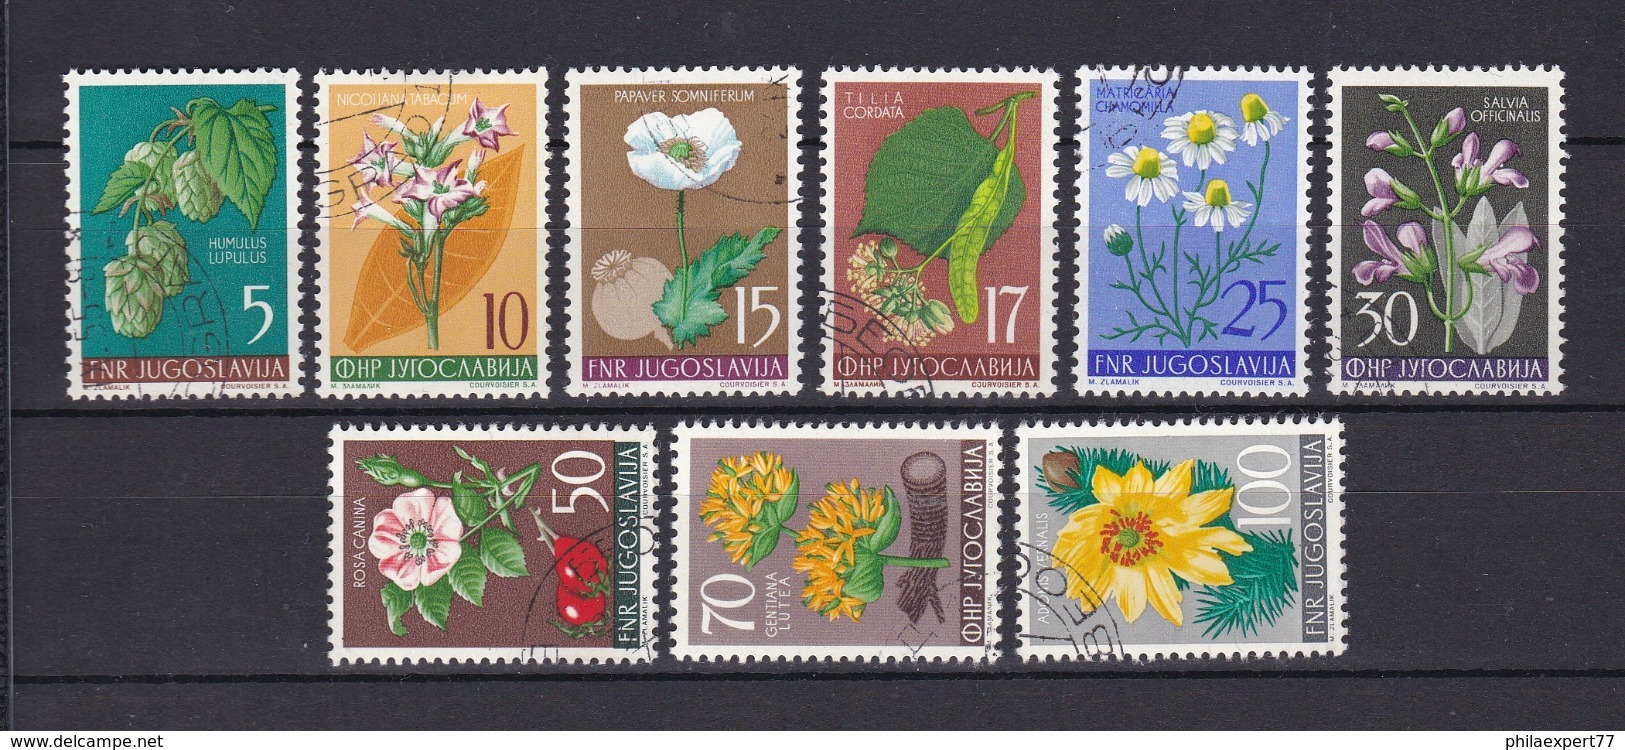 Jugoslawien - 1955 - Michel Nr. 765/773 - Gest. - 20 Euro - 1945-1992 Sozialistische Föderative Republik Jugoslawien